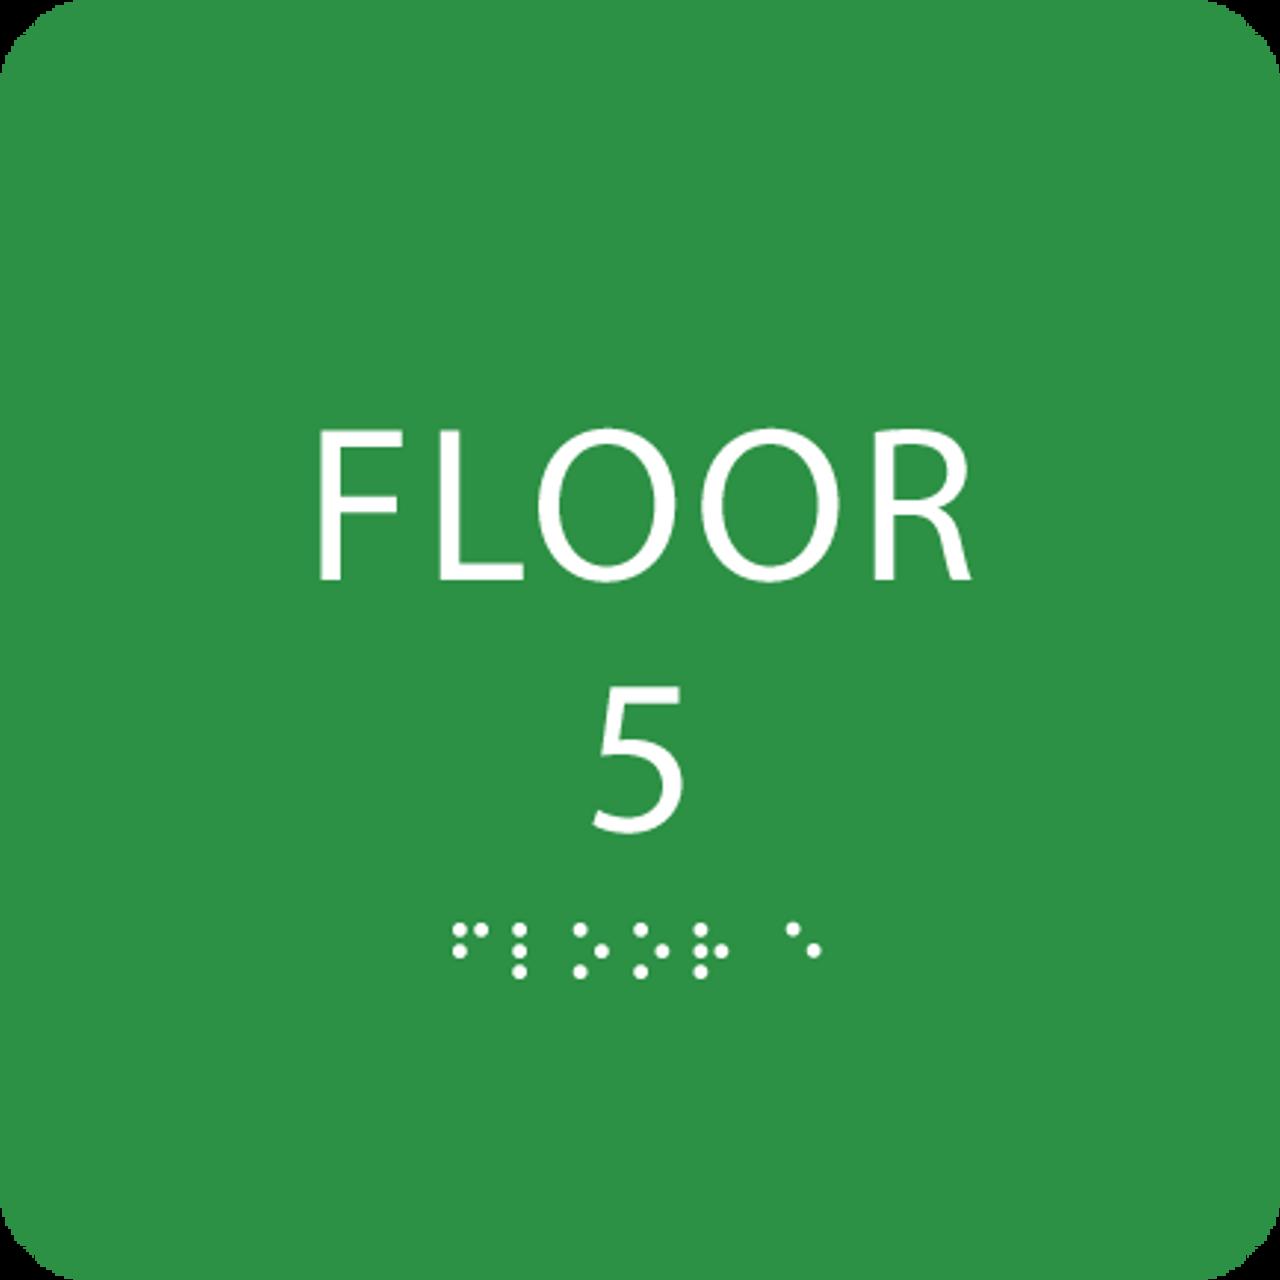 Green Floor 5 Level Identification Sign